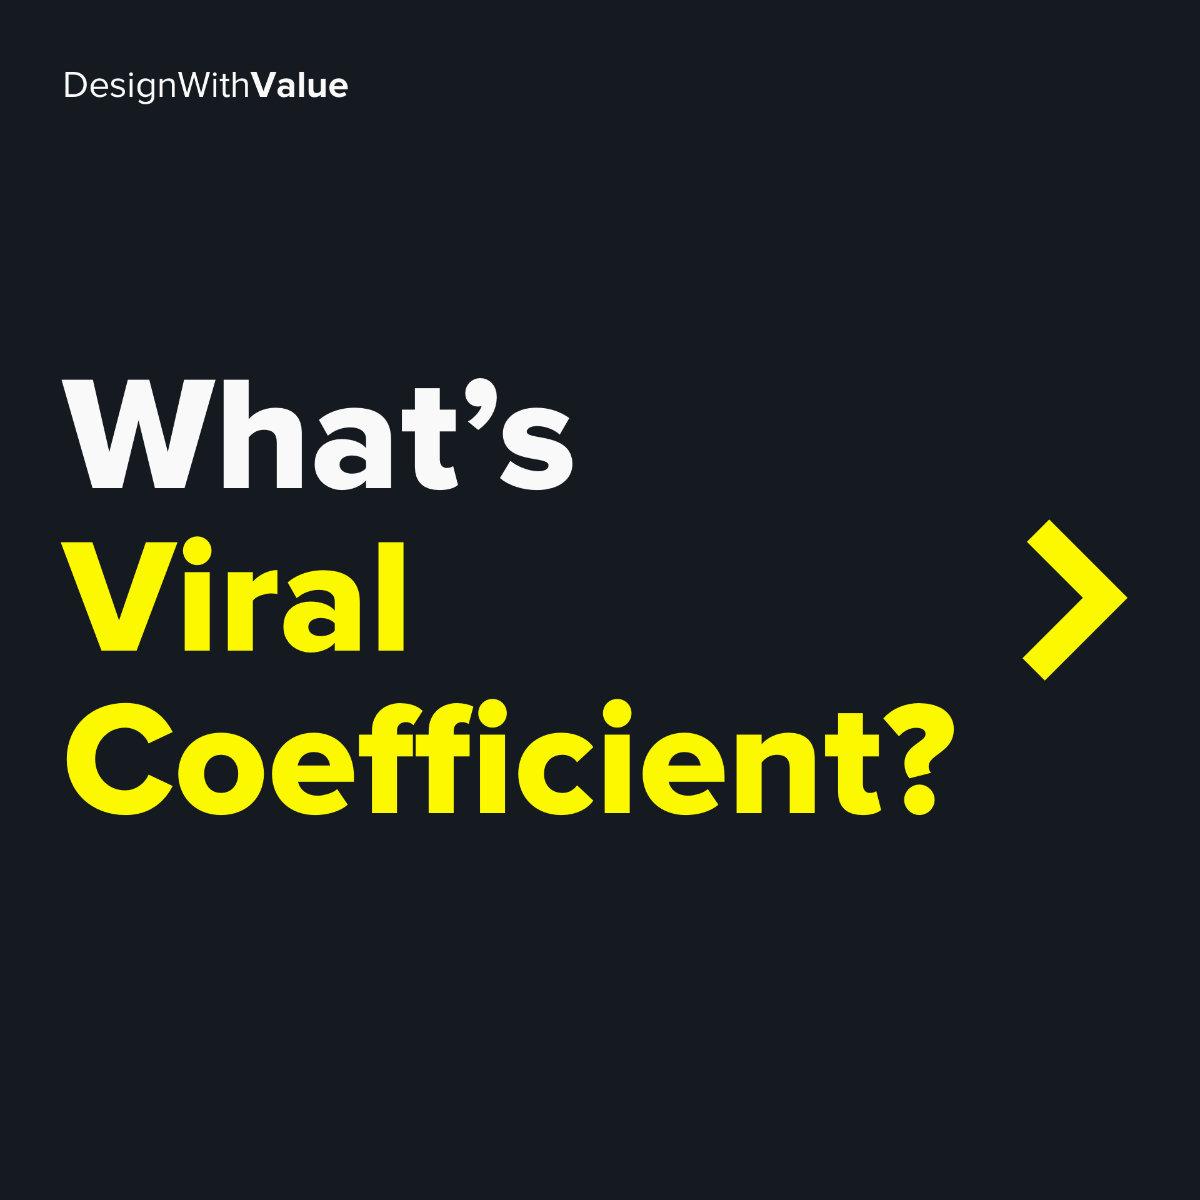 What's viral coefficient?